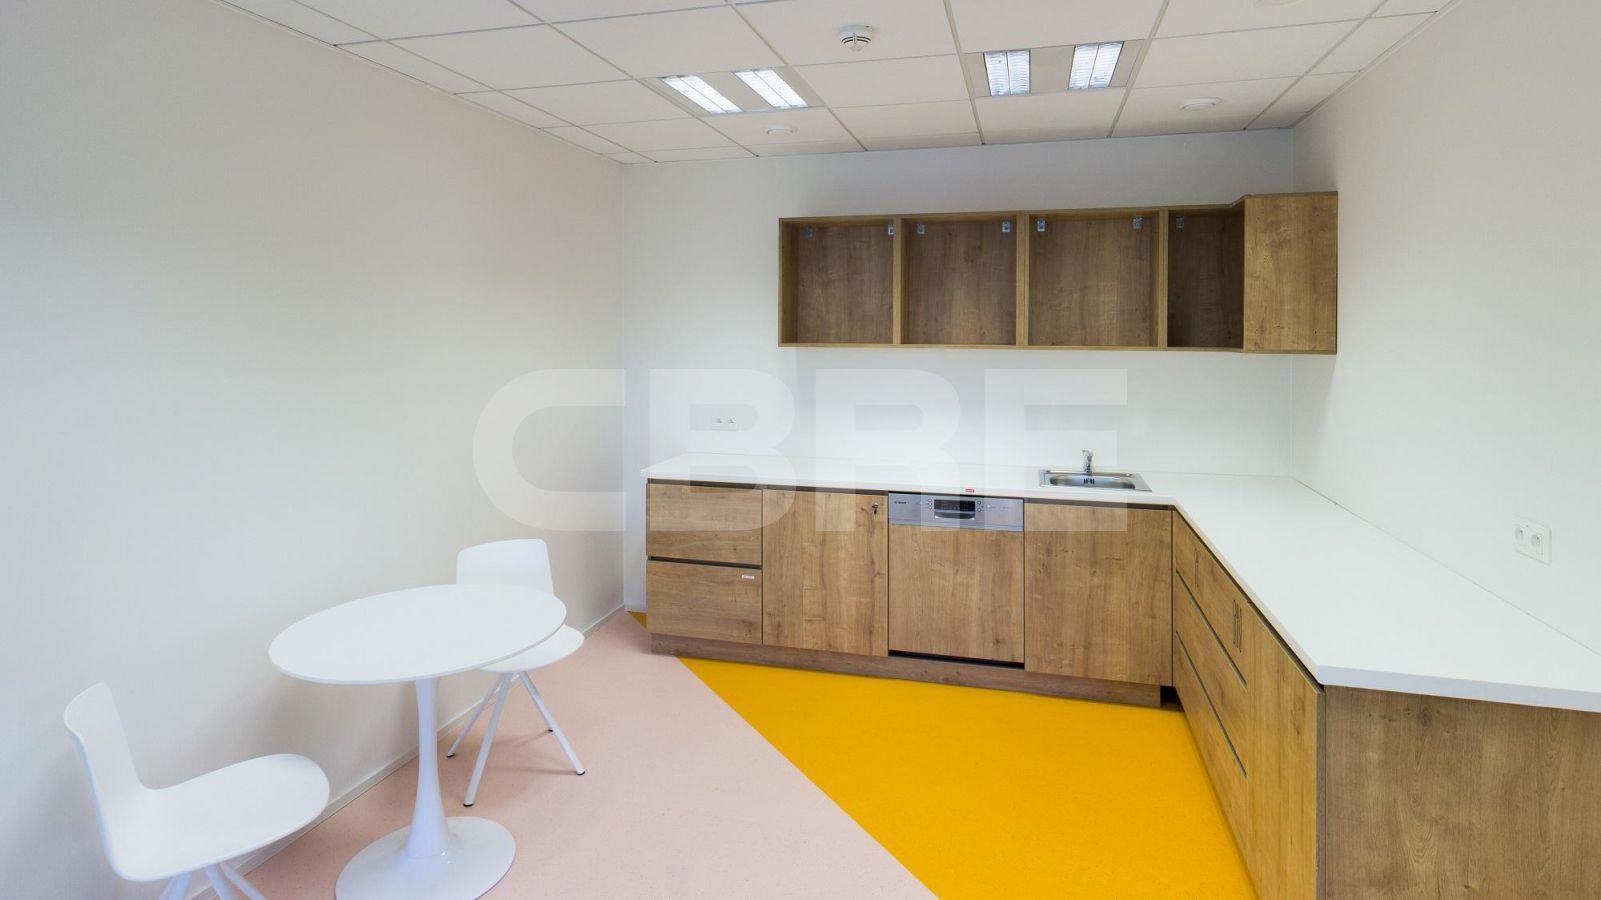 CBC IV, Bratislava - Staré Mesto | Offices for rent by CBRE | 8